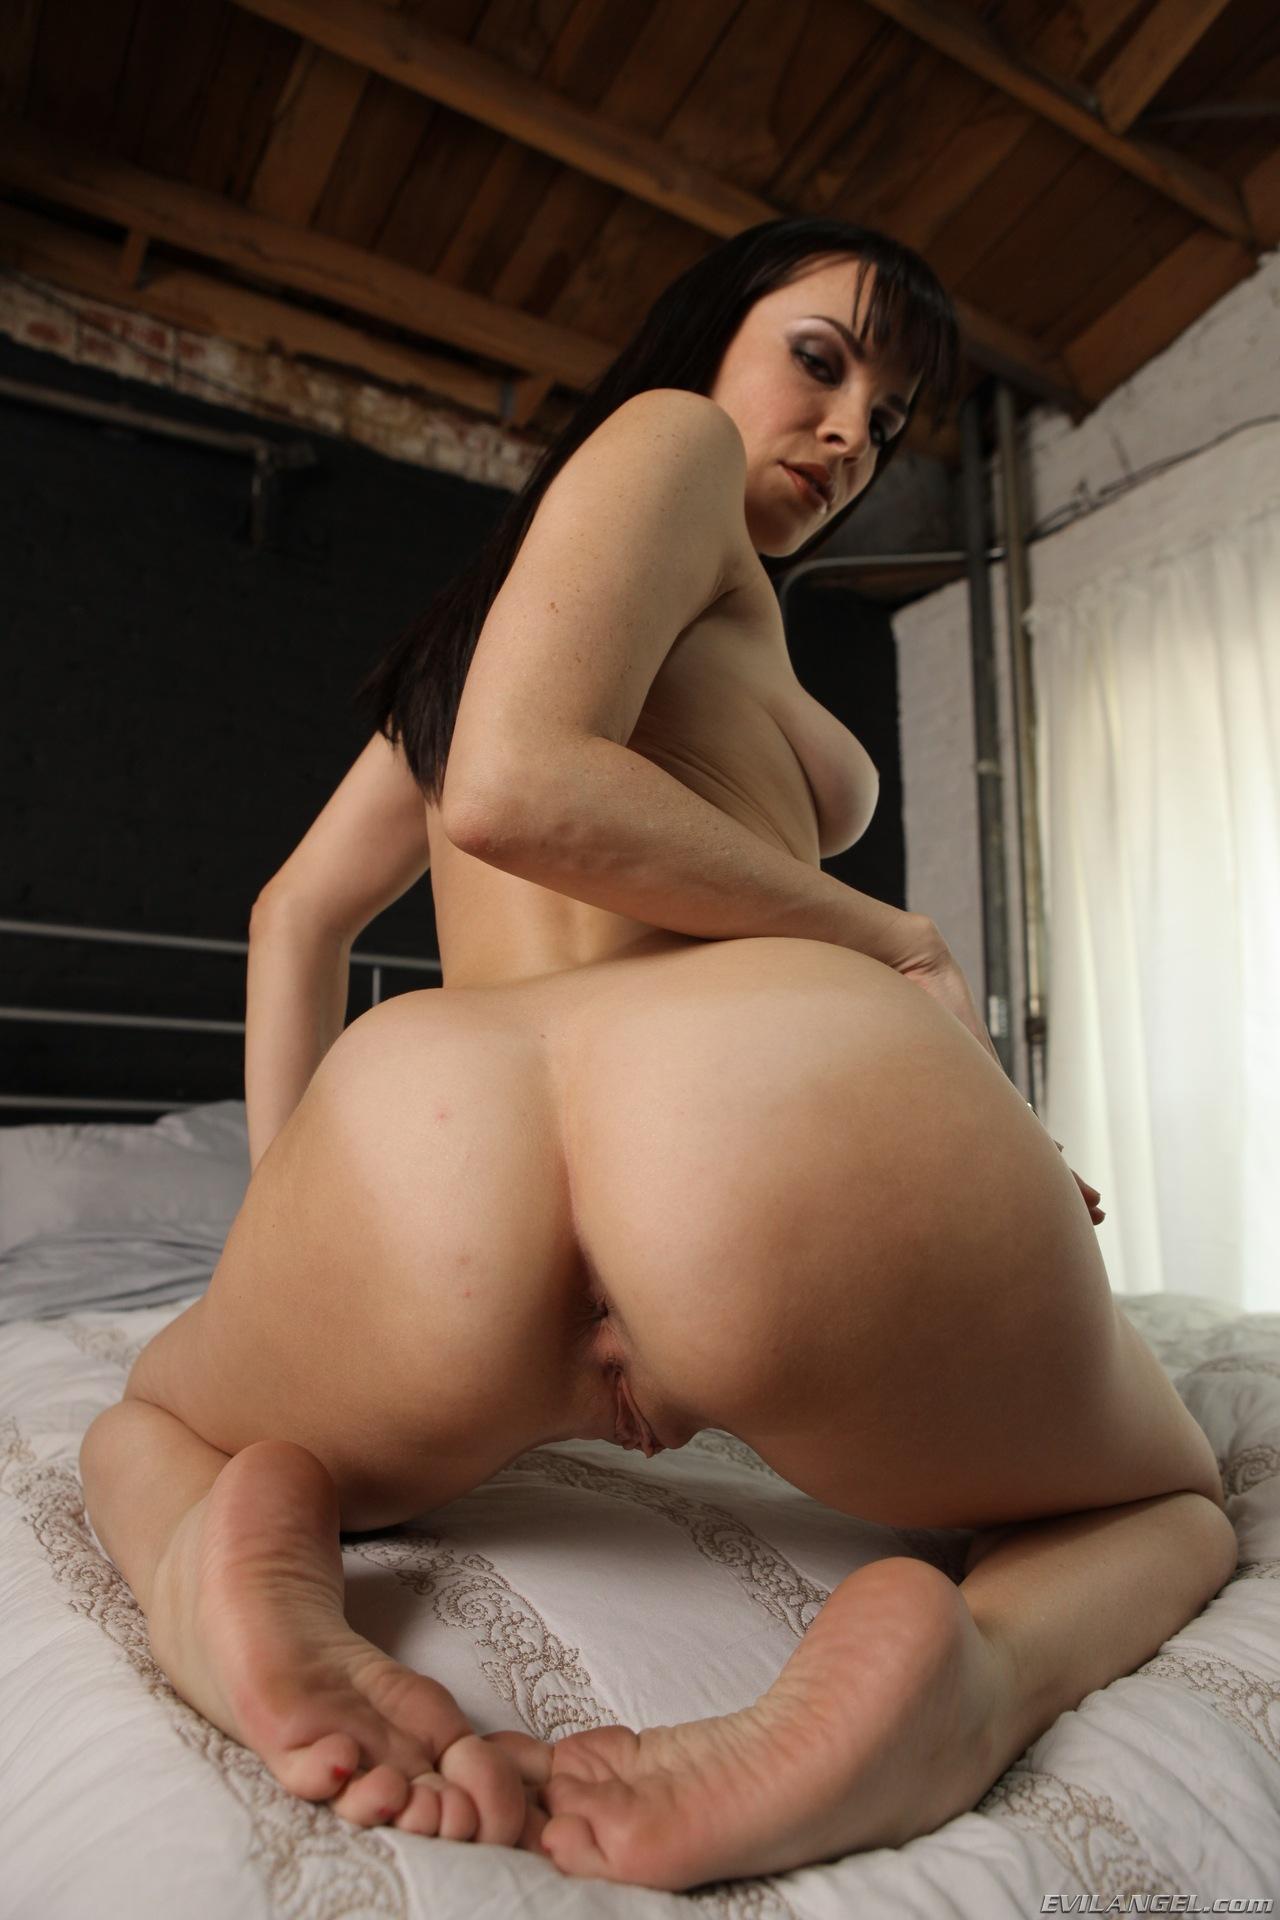 Dana dearmond porn star